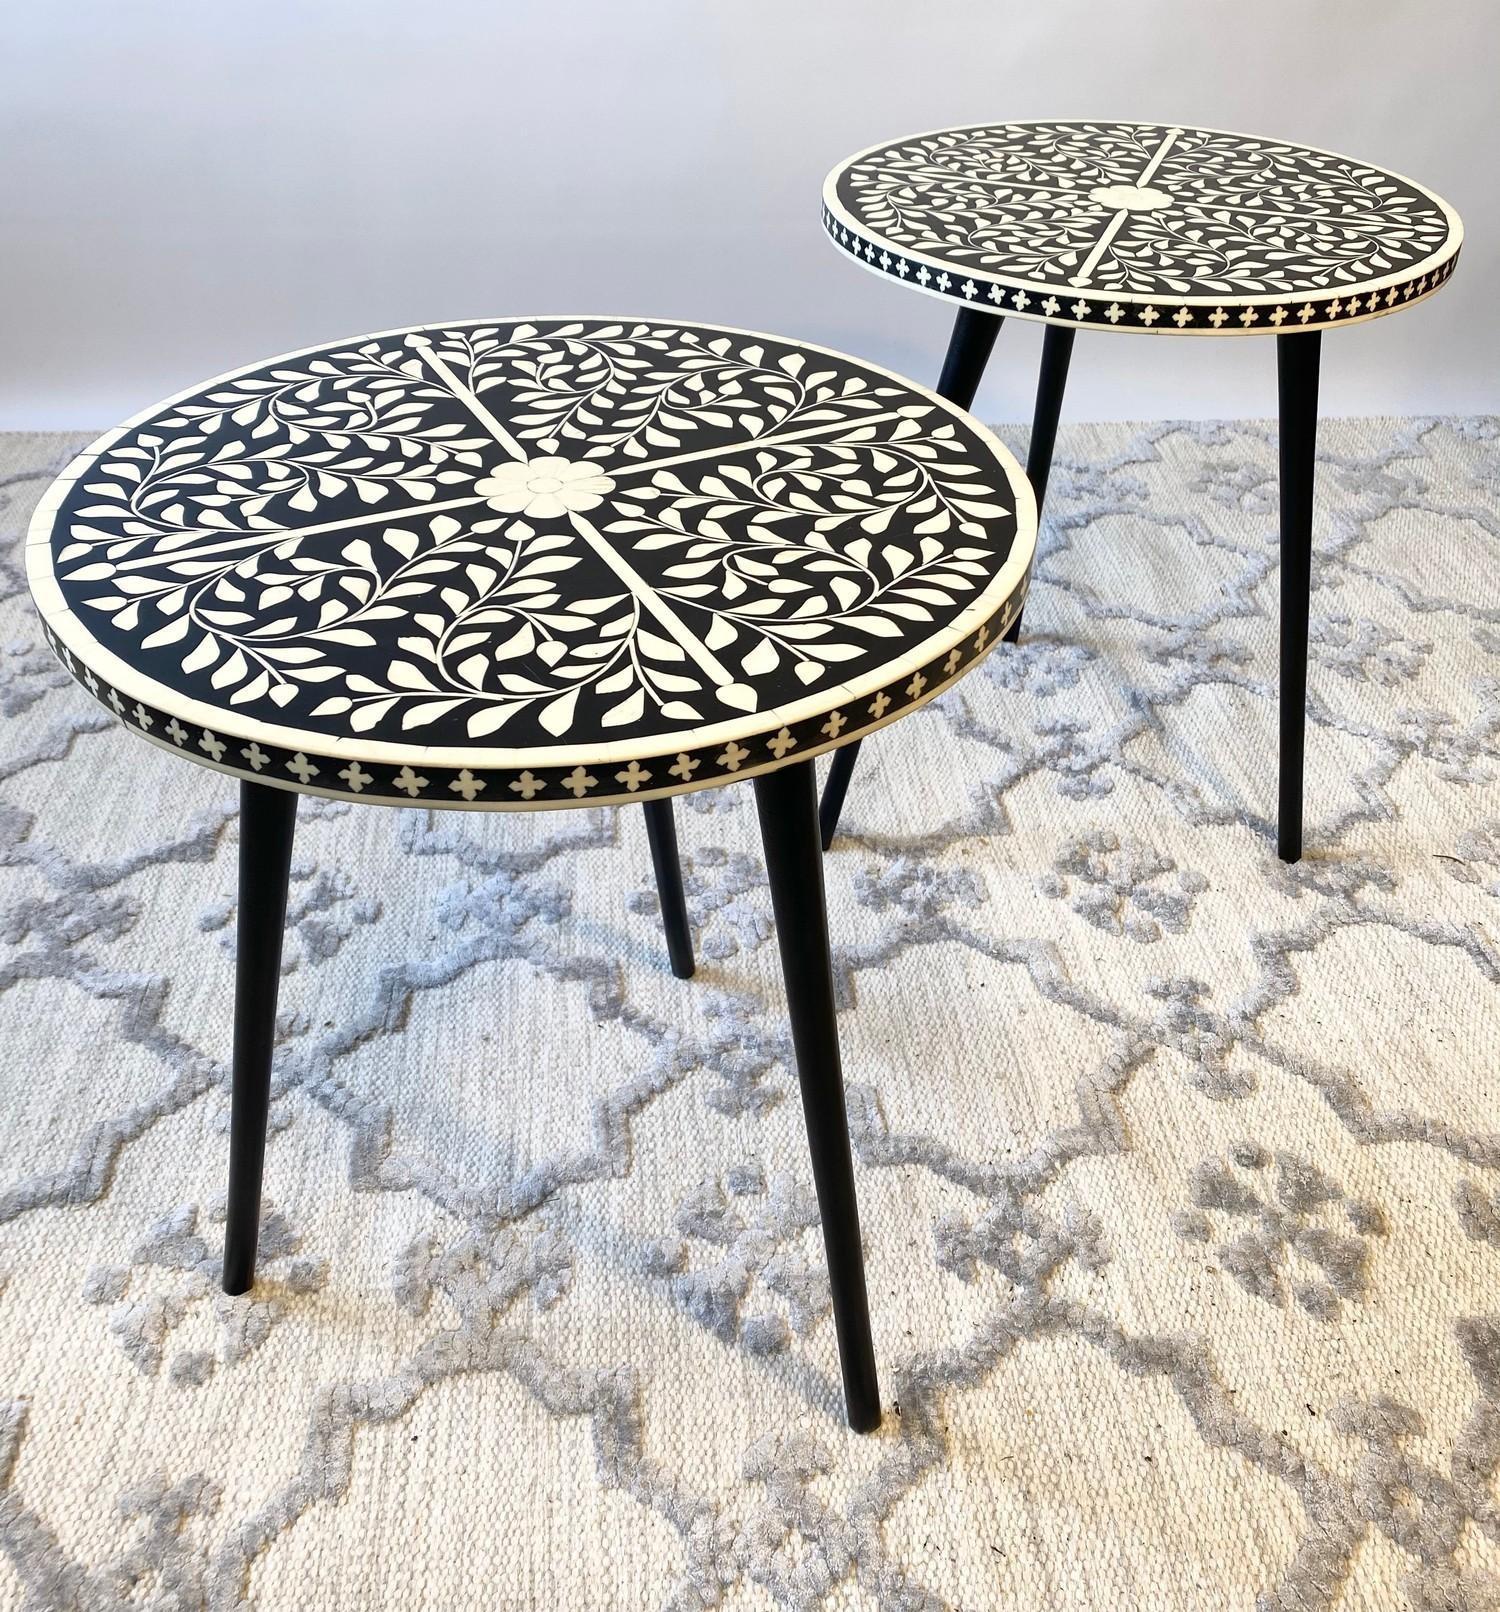 LAMP TABLES, a pair, Moorish design inlaid tops on tripod metal legs, 47cm H x 41cm x 41cm. (2)